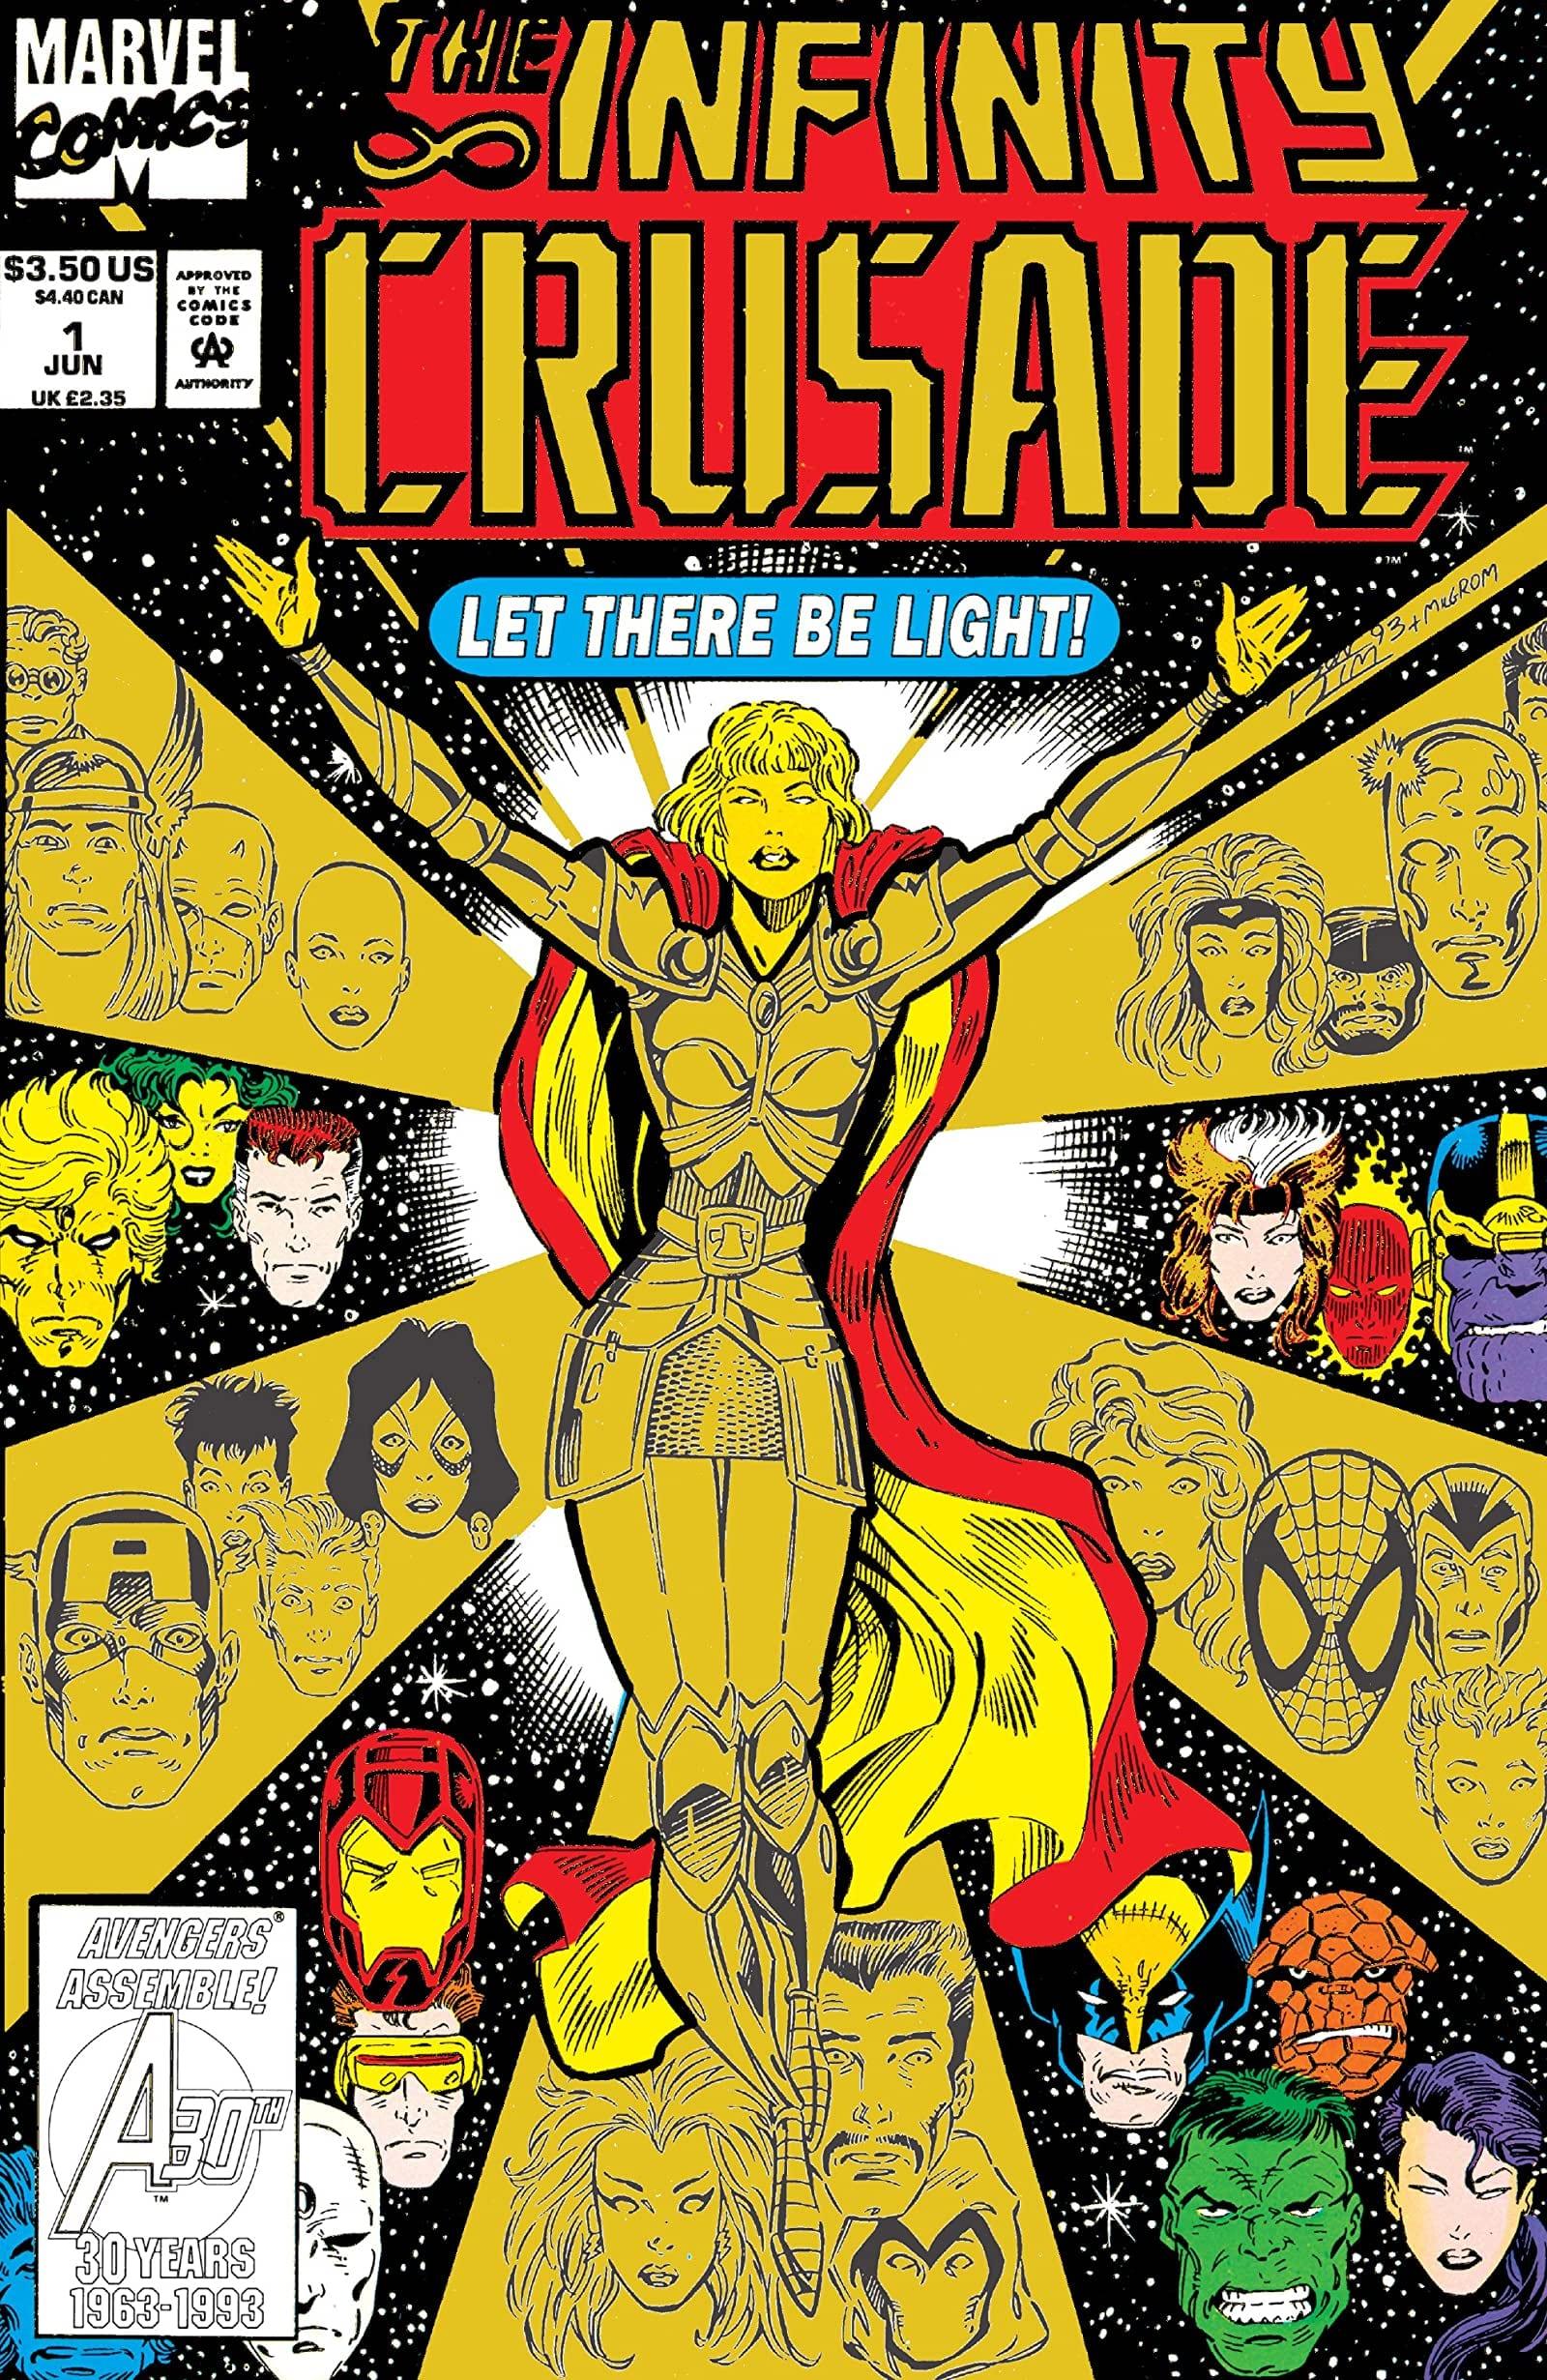 Comic completo The Infinity Crusade